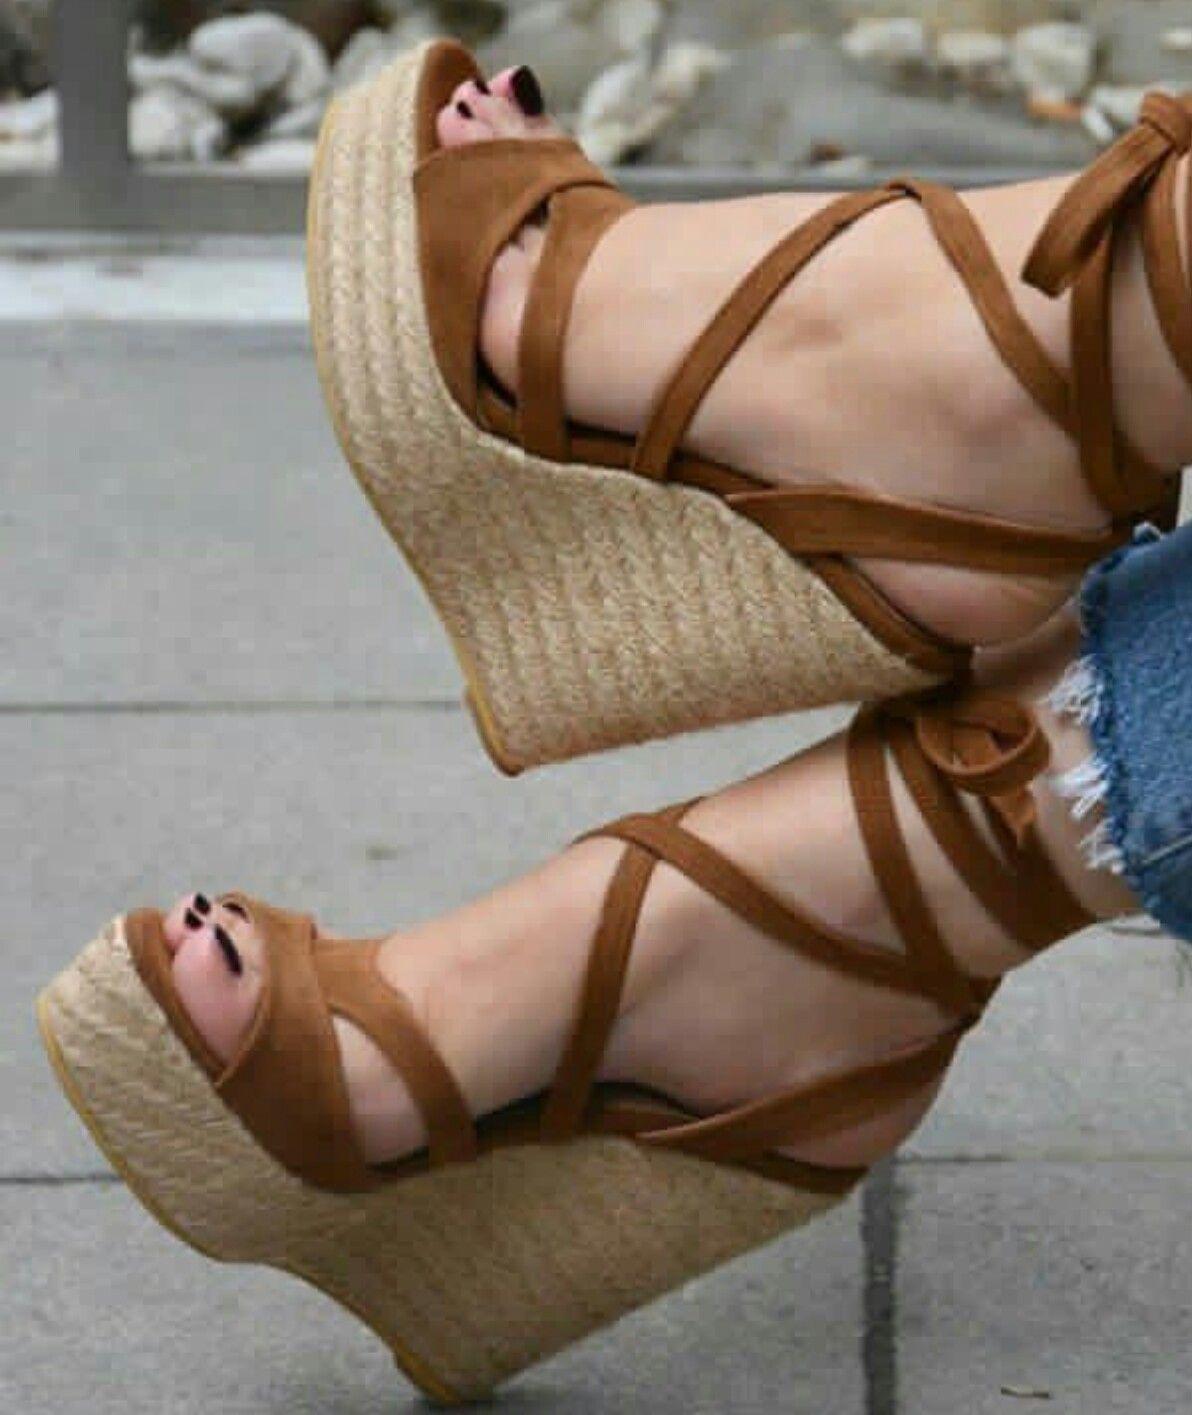 02e37f9eef24 ... Shoes Styles   Design. Plataformas de corcho con tacón de 15cm.